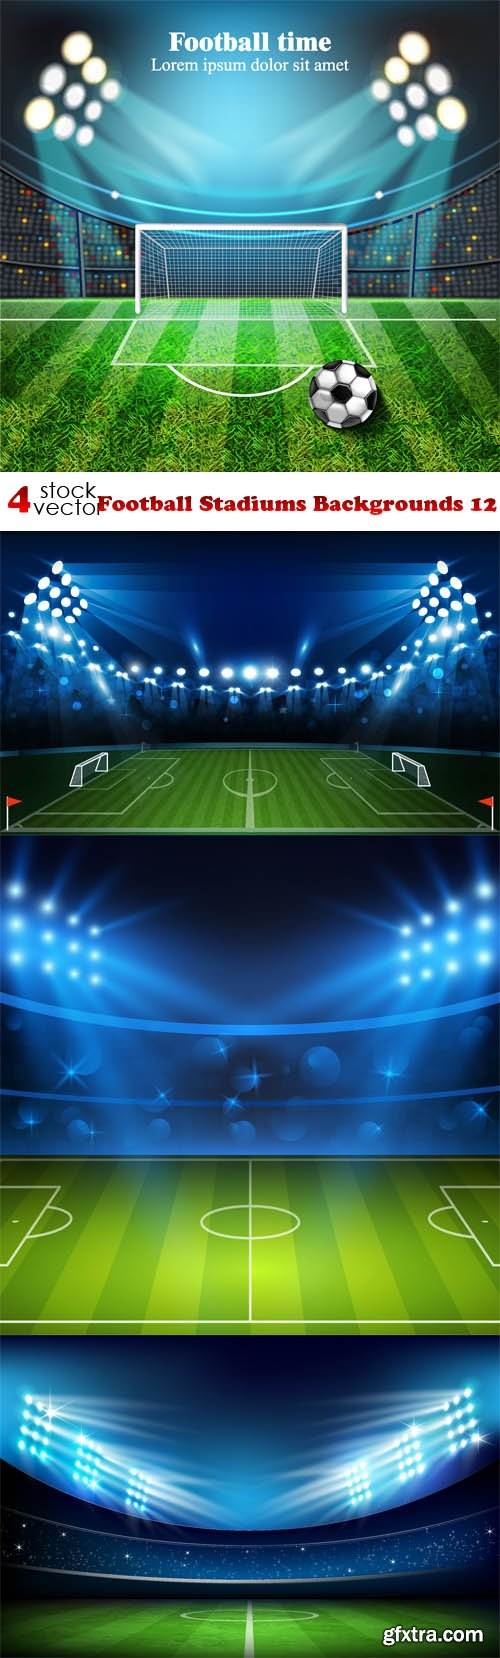 Vectors - Football Stadiums Backgrounds 12